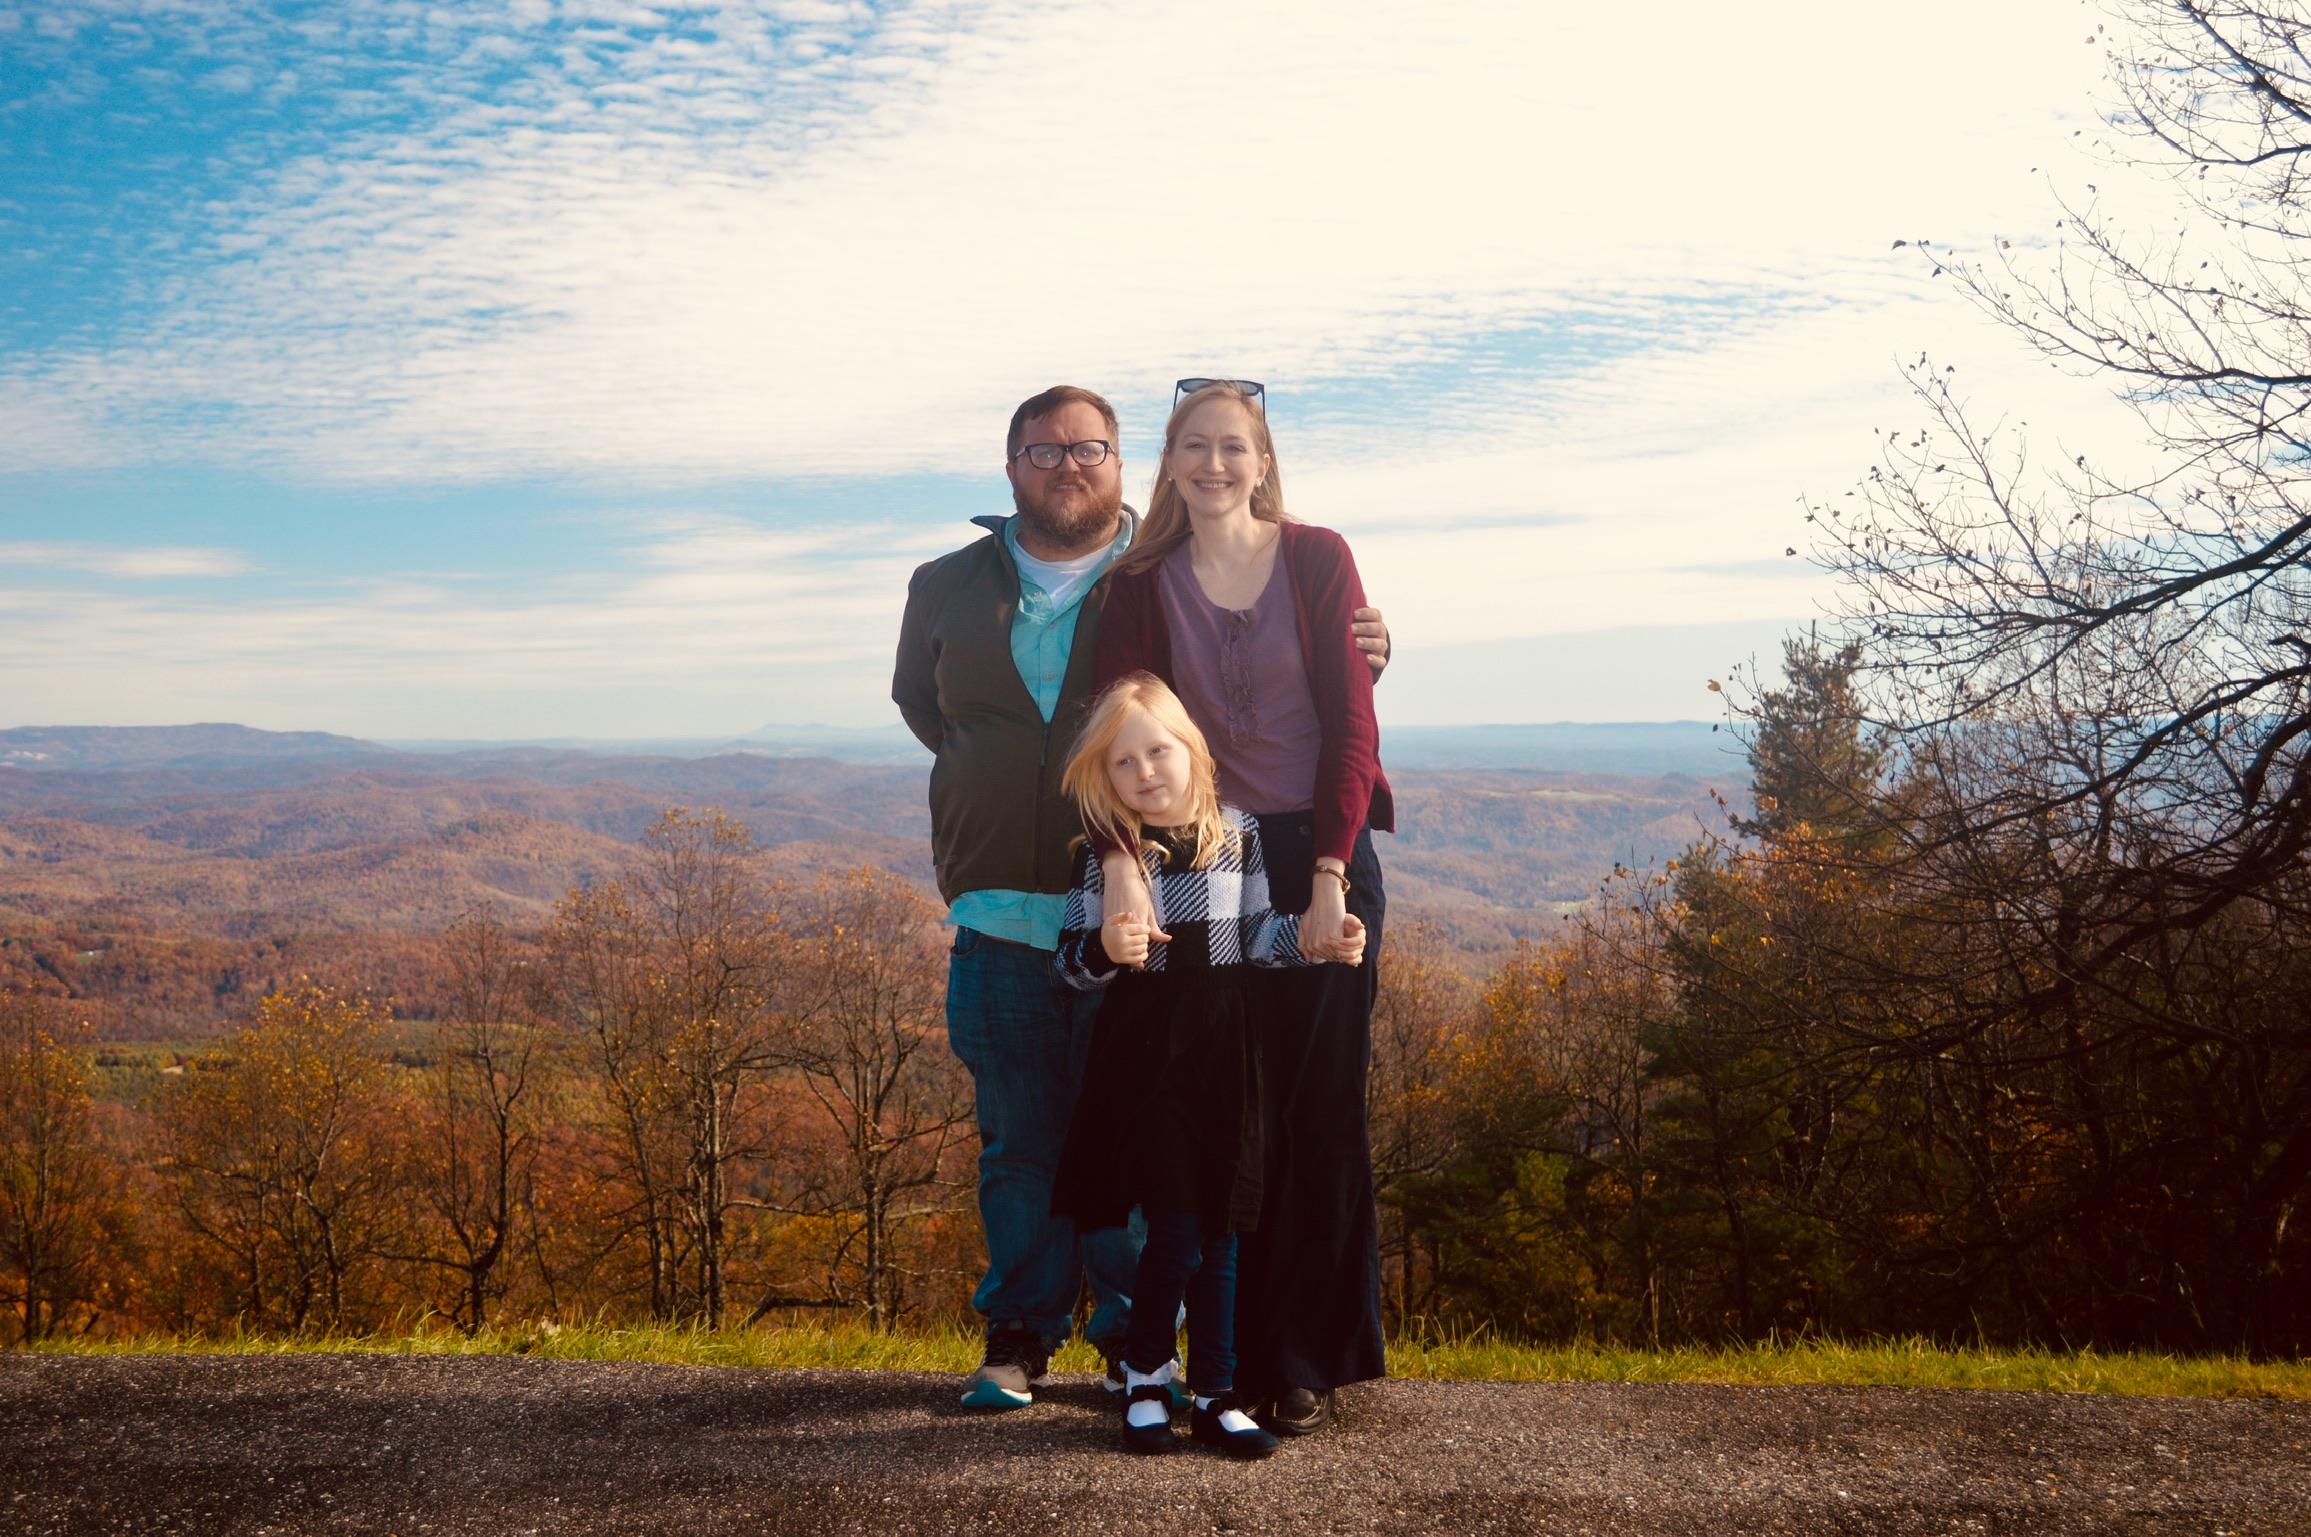 Waiting it out in North Carolina, where Brandon's parents live near Winston-Salem